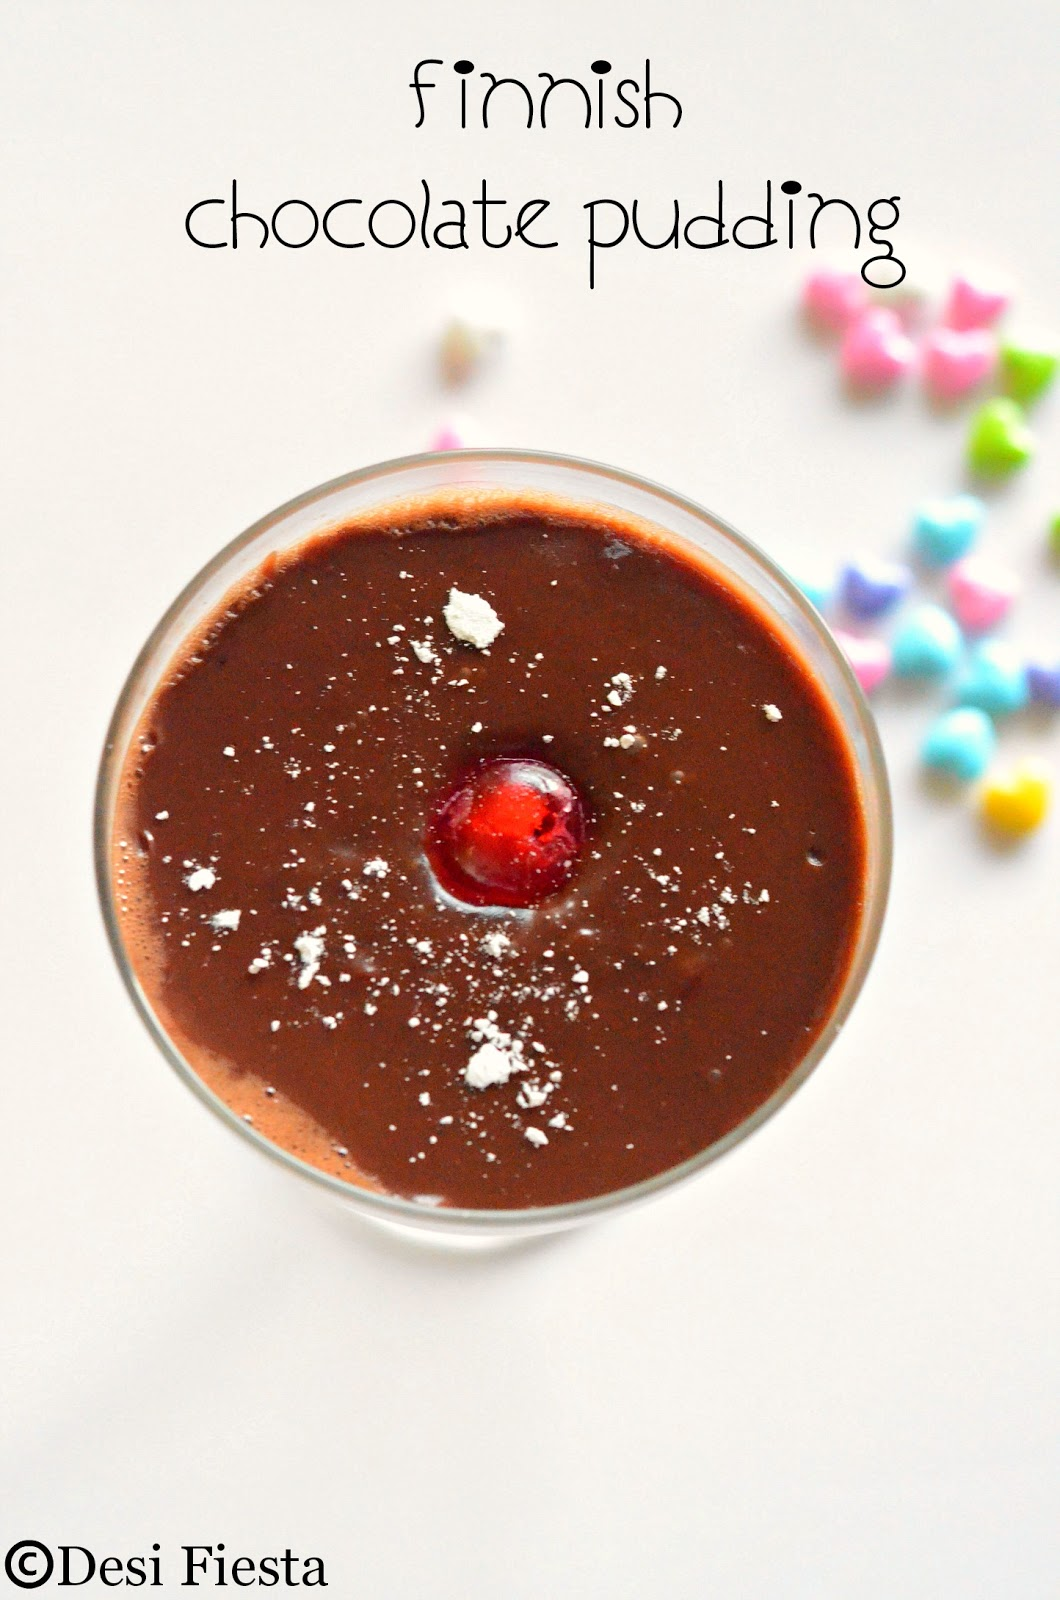 Light chocolate pudding recipe